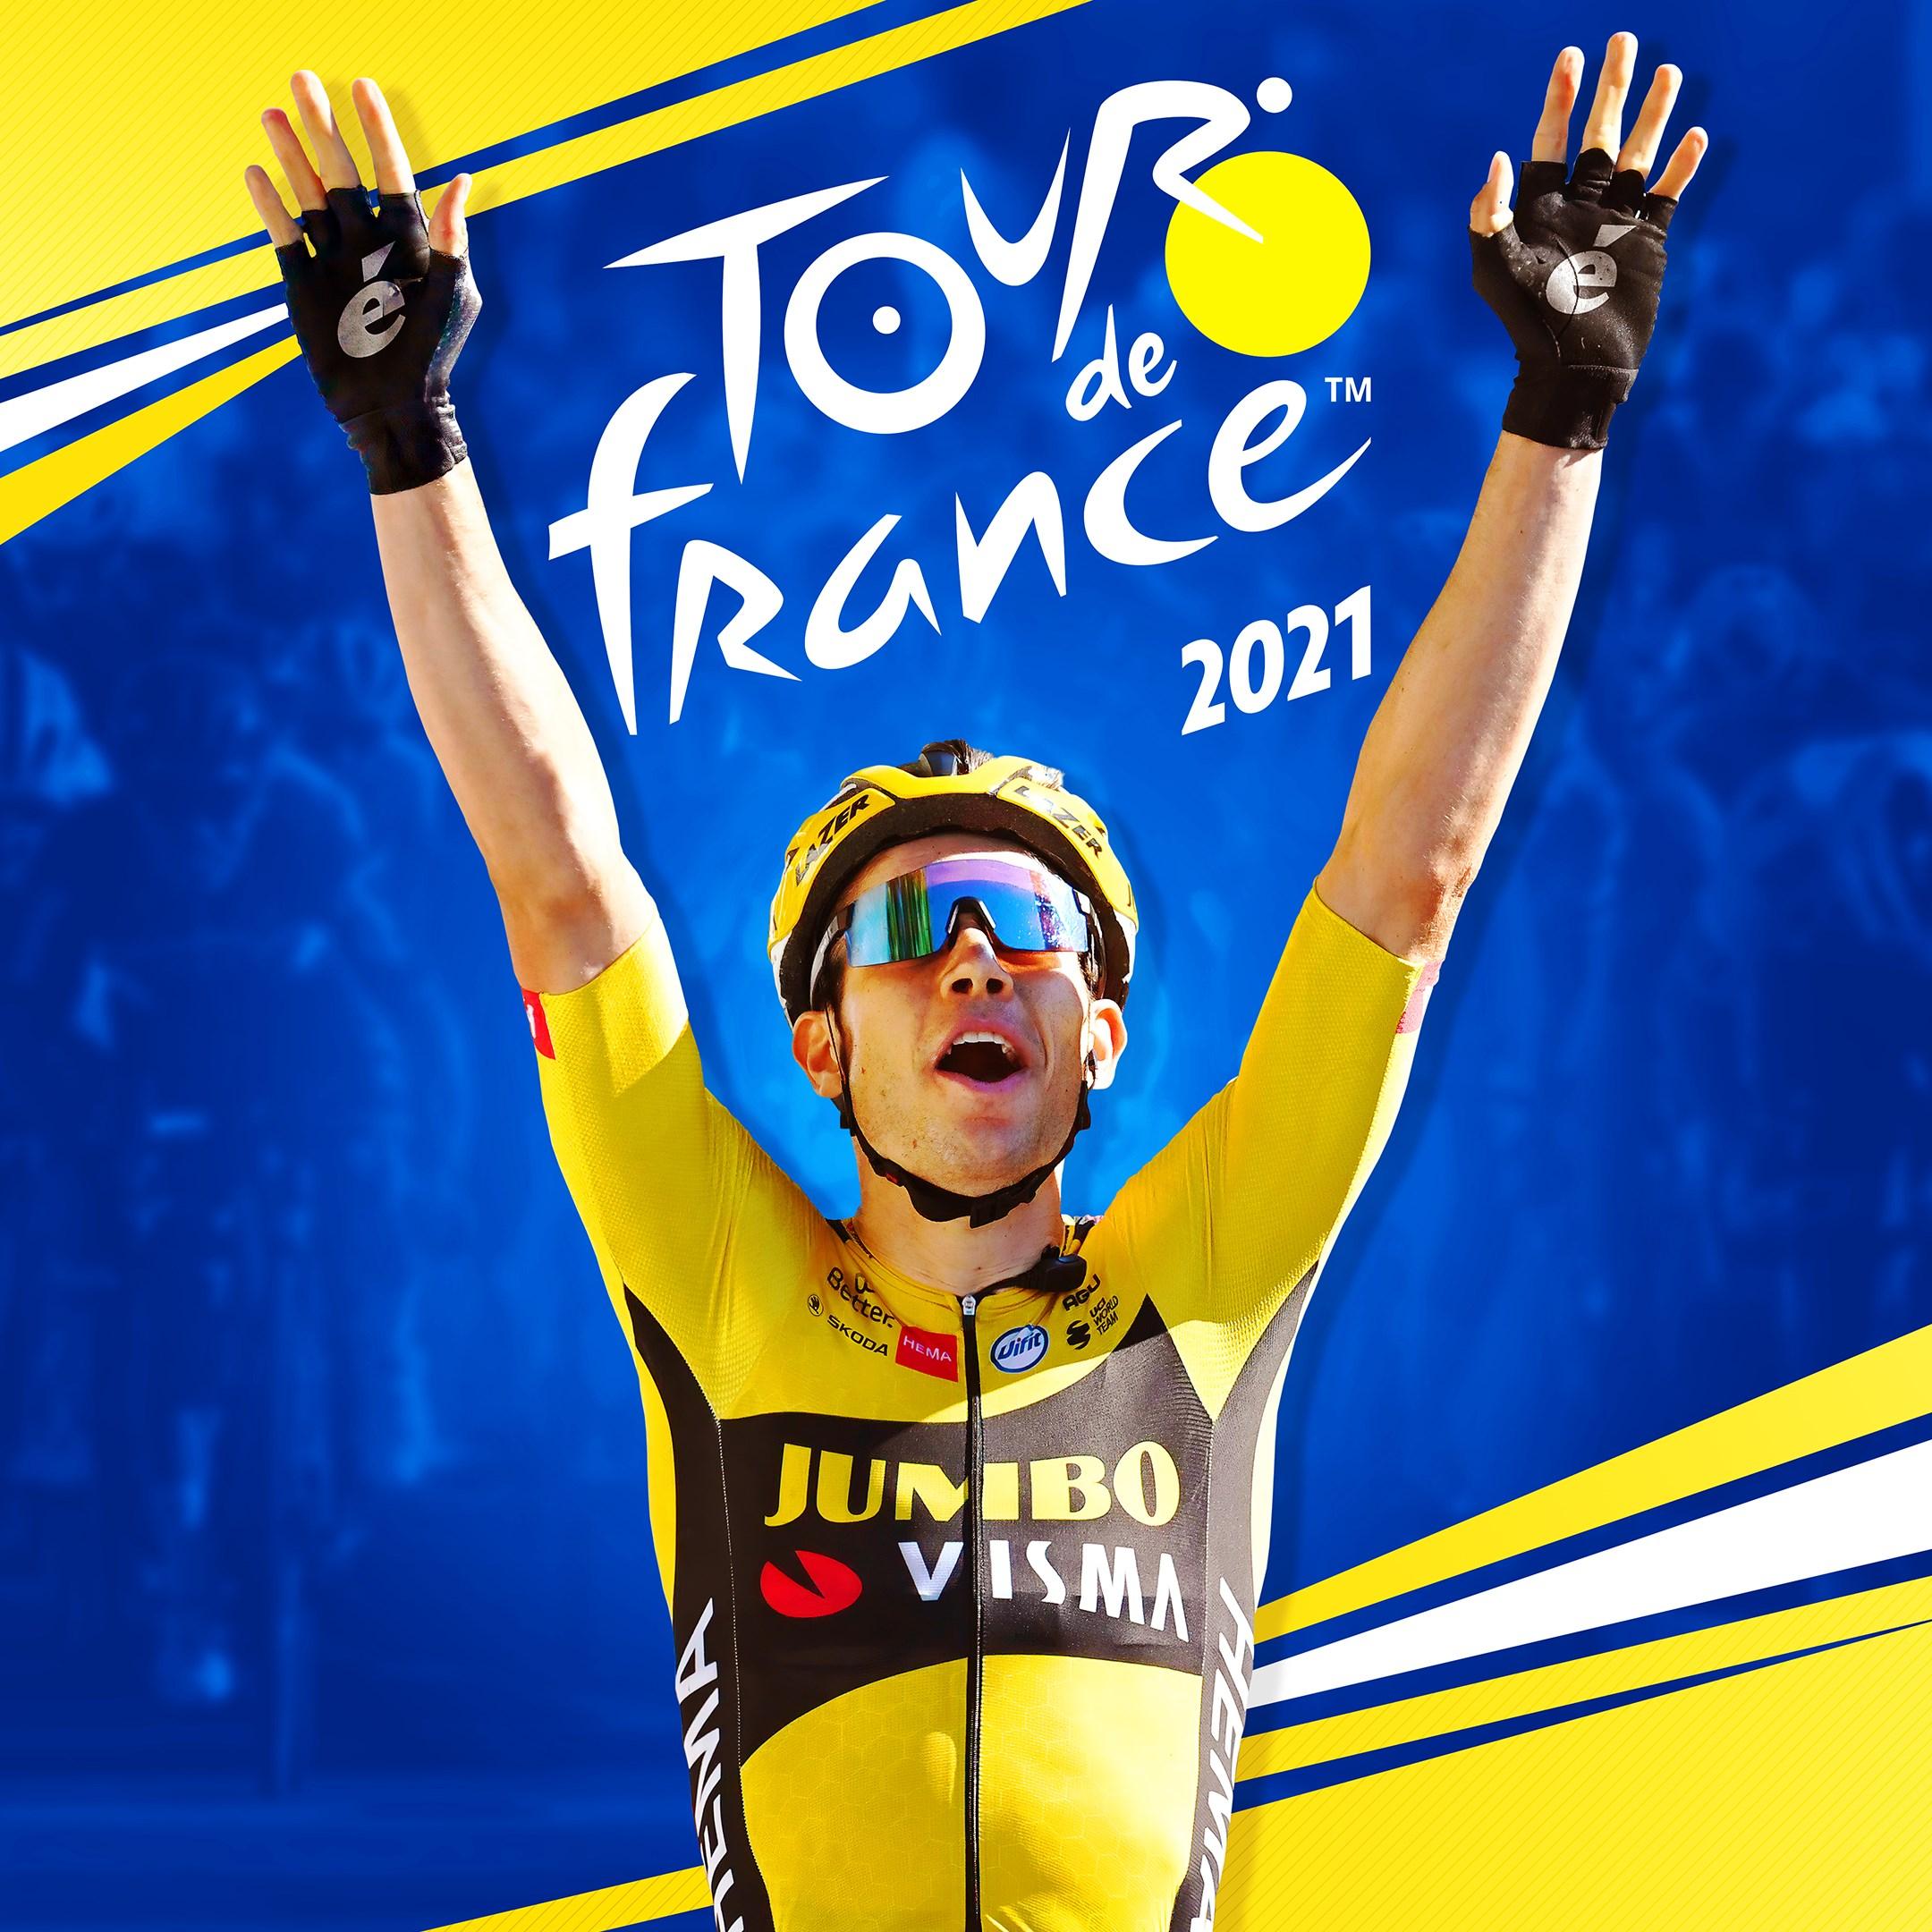 Image for Tour de France 2021 Xbox One